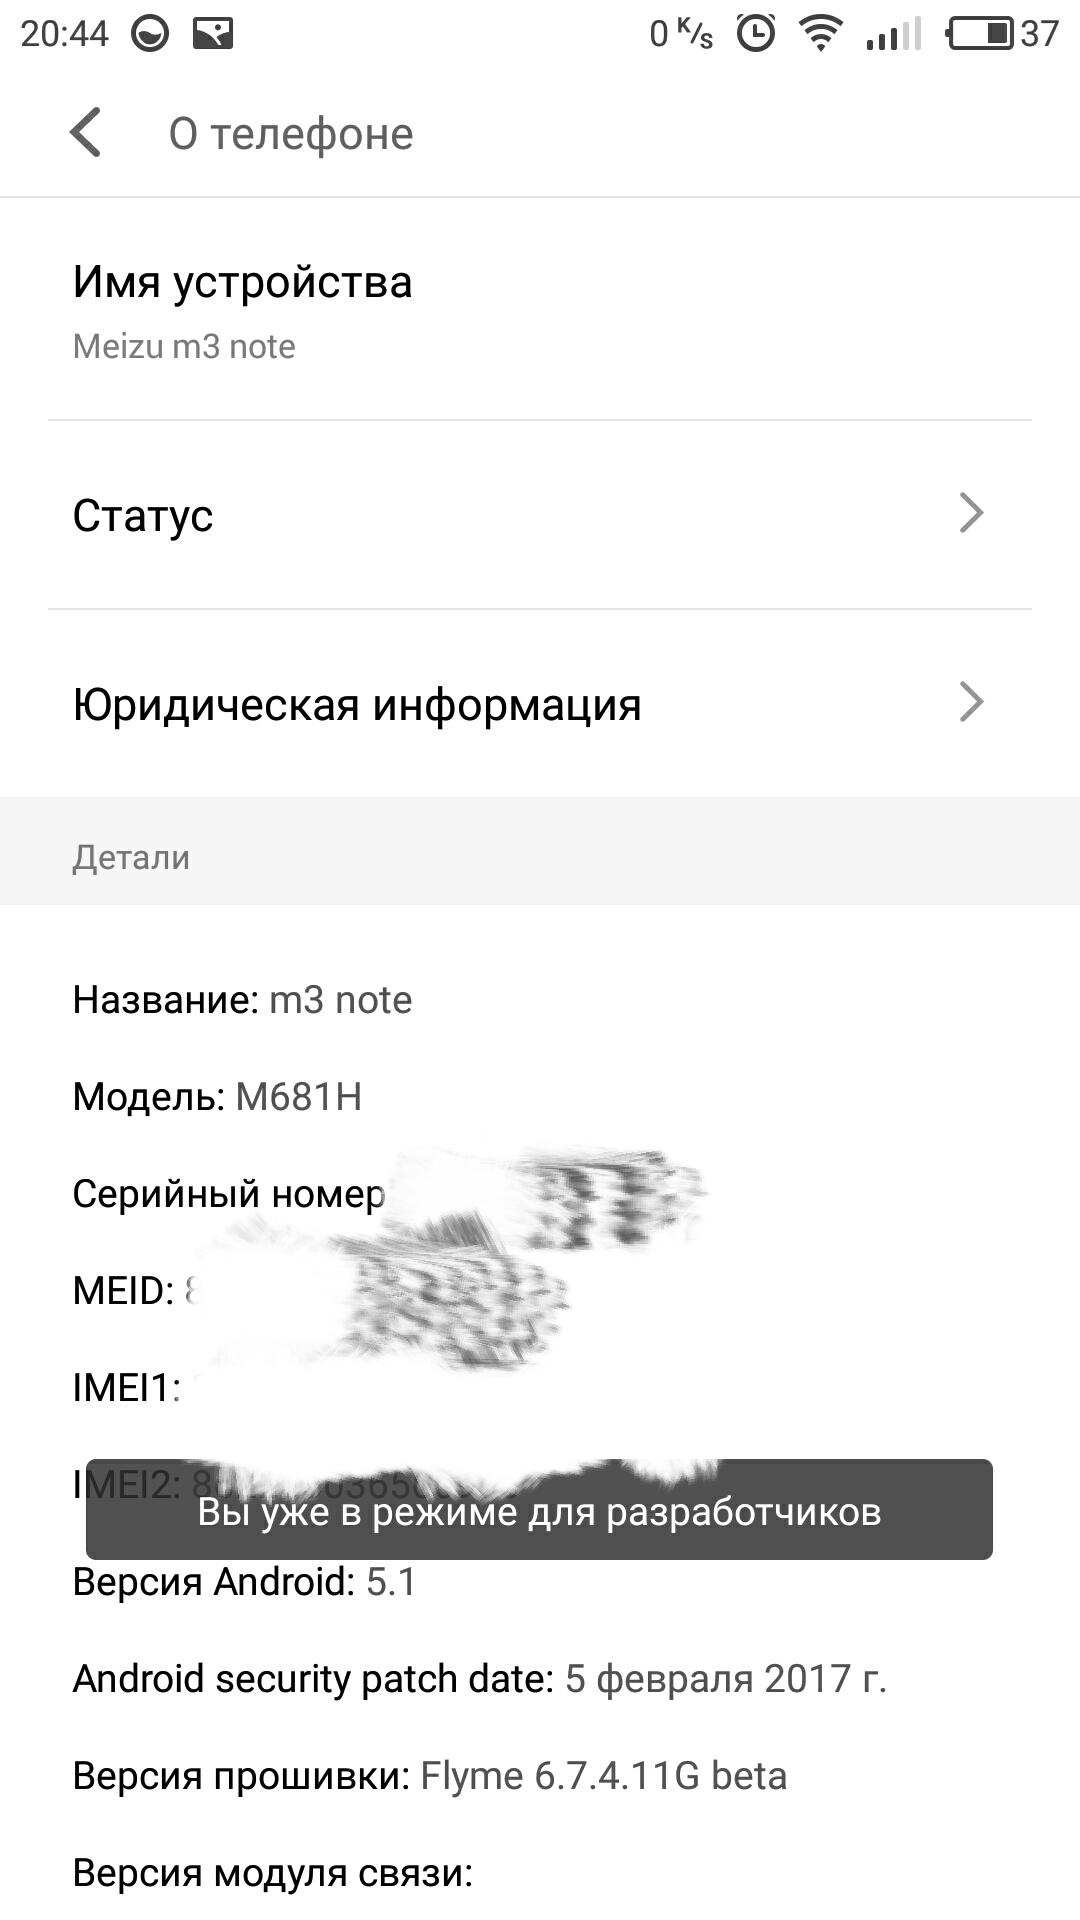 S70411-204401(1).jpg